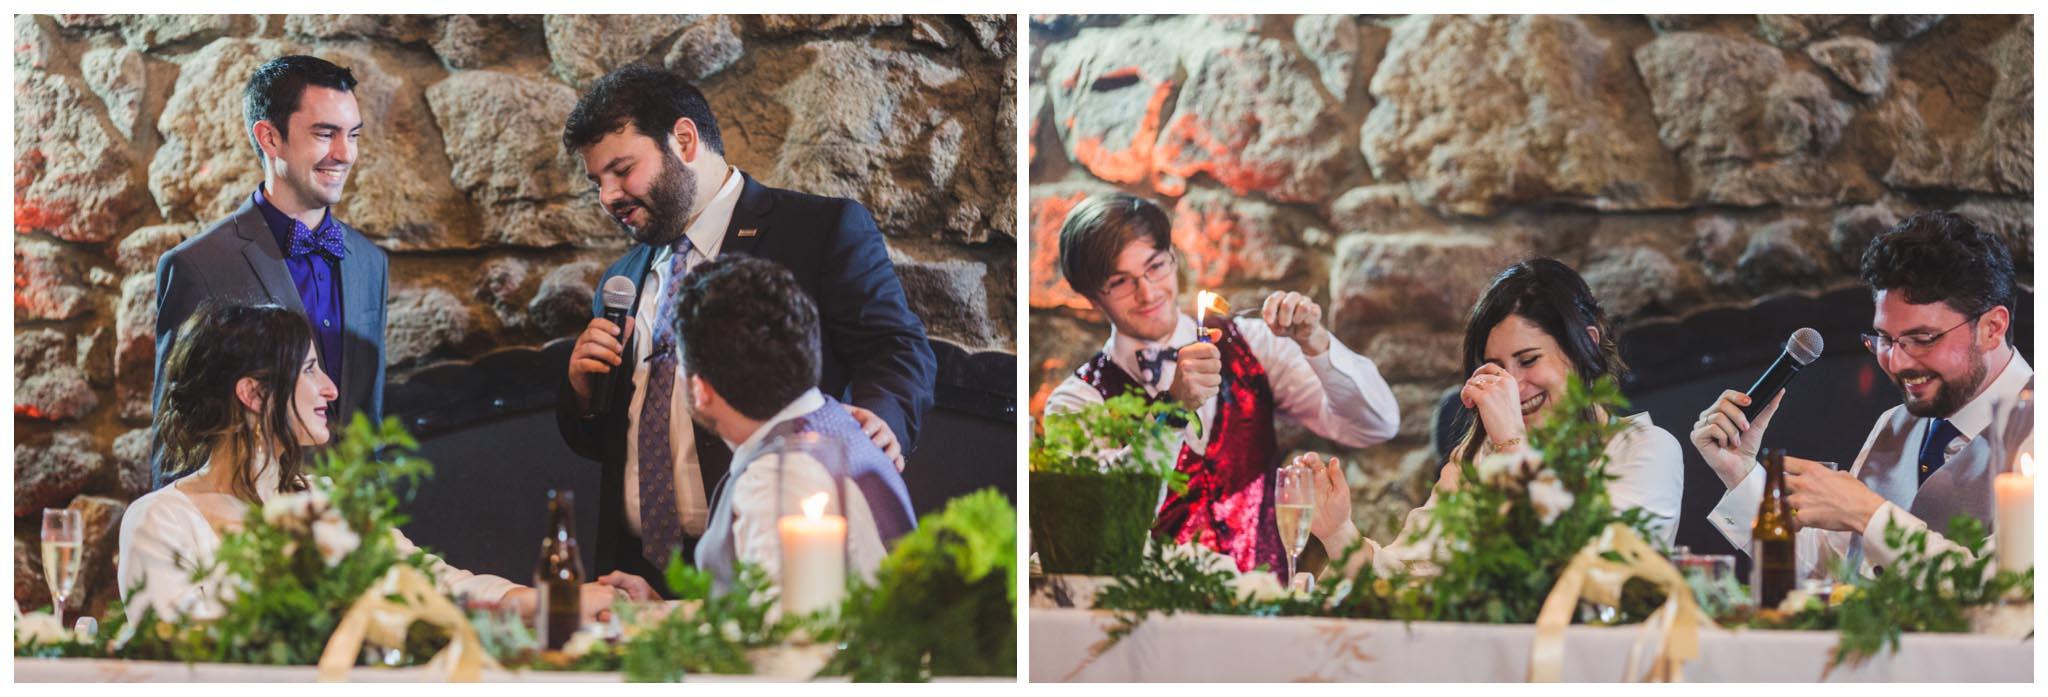 toasts, Bay Area, wedding, Berkeley